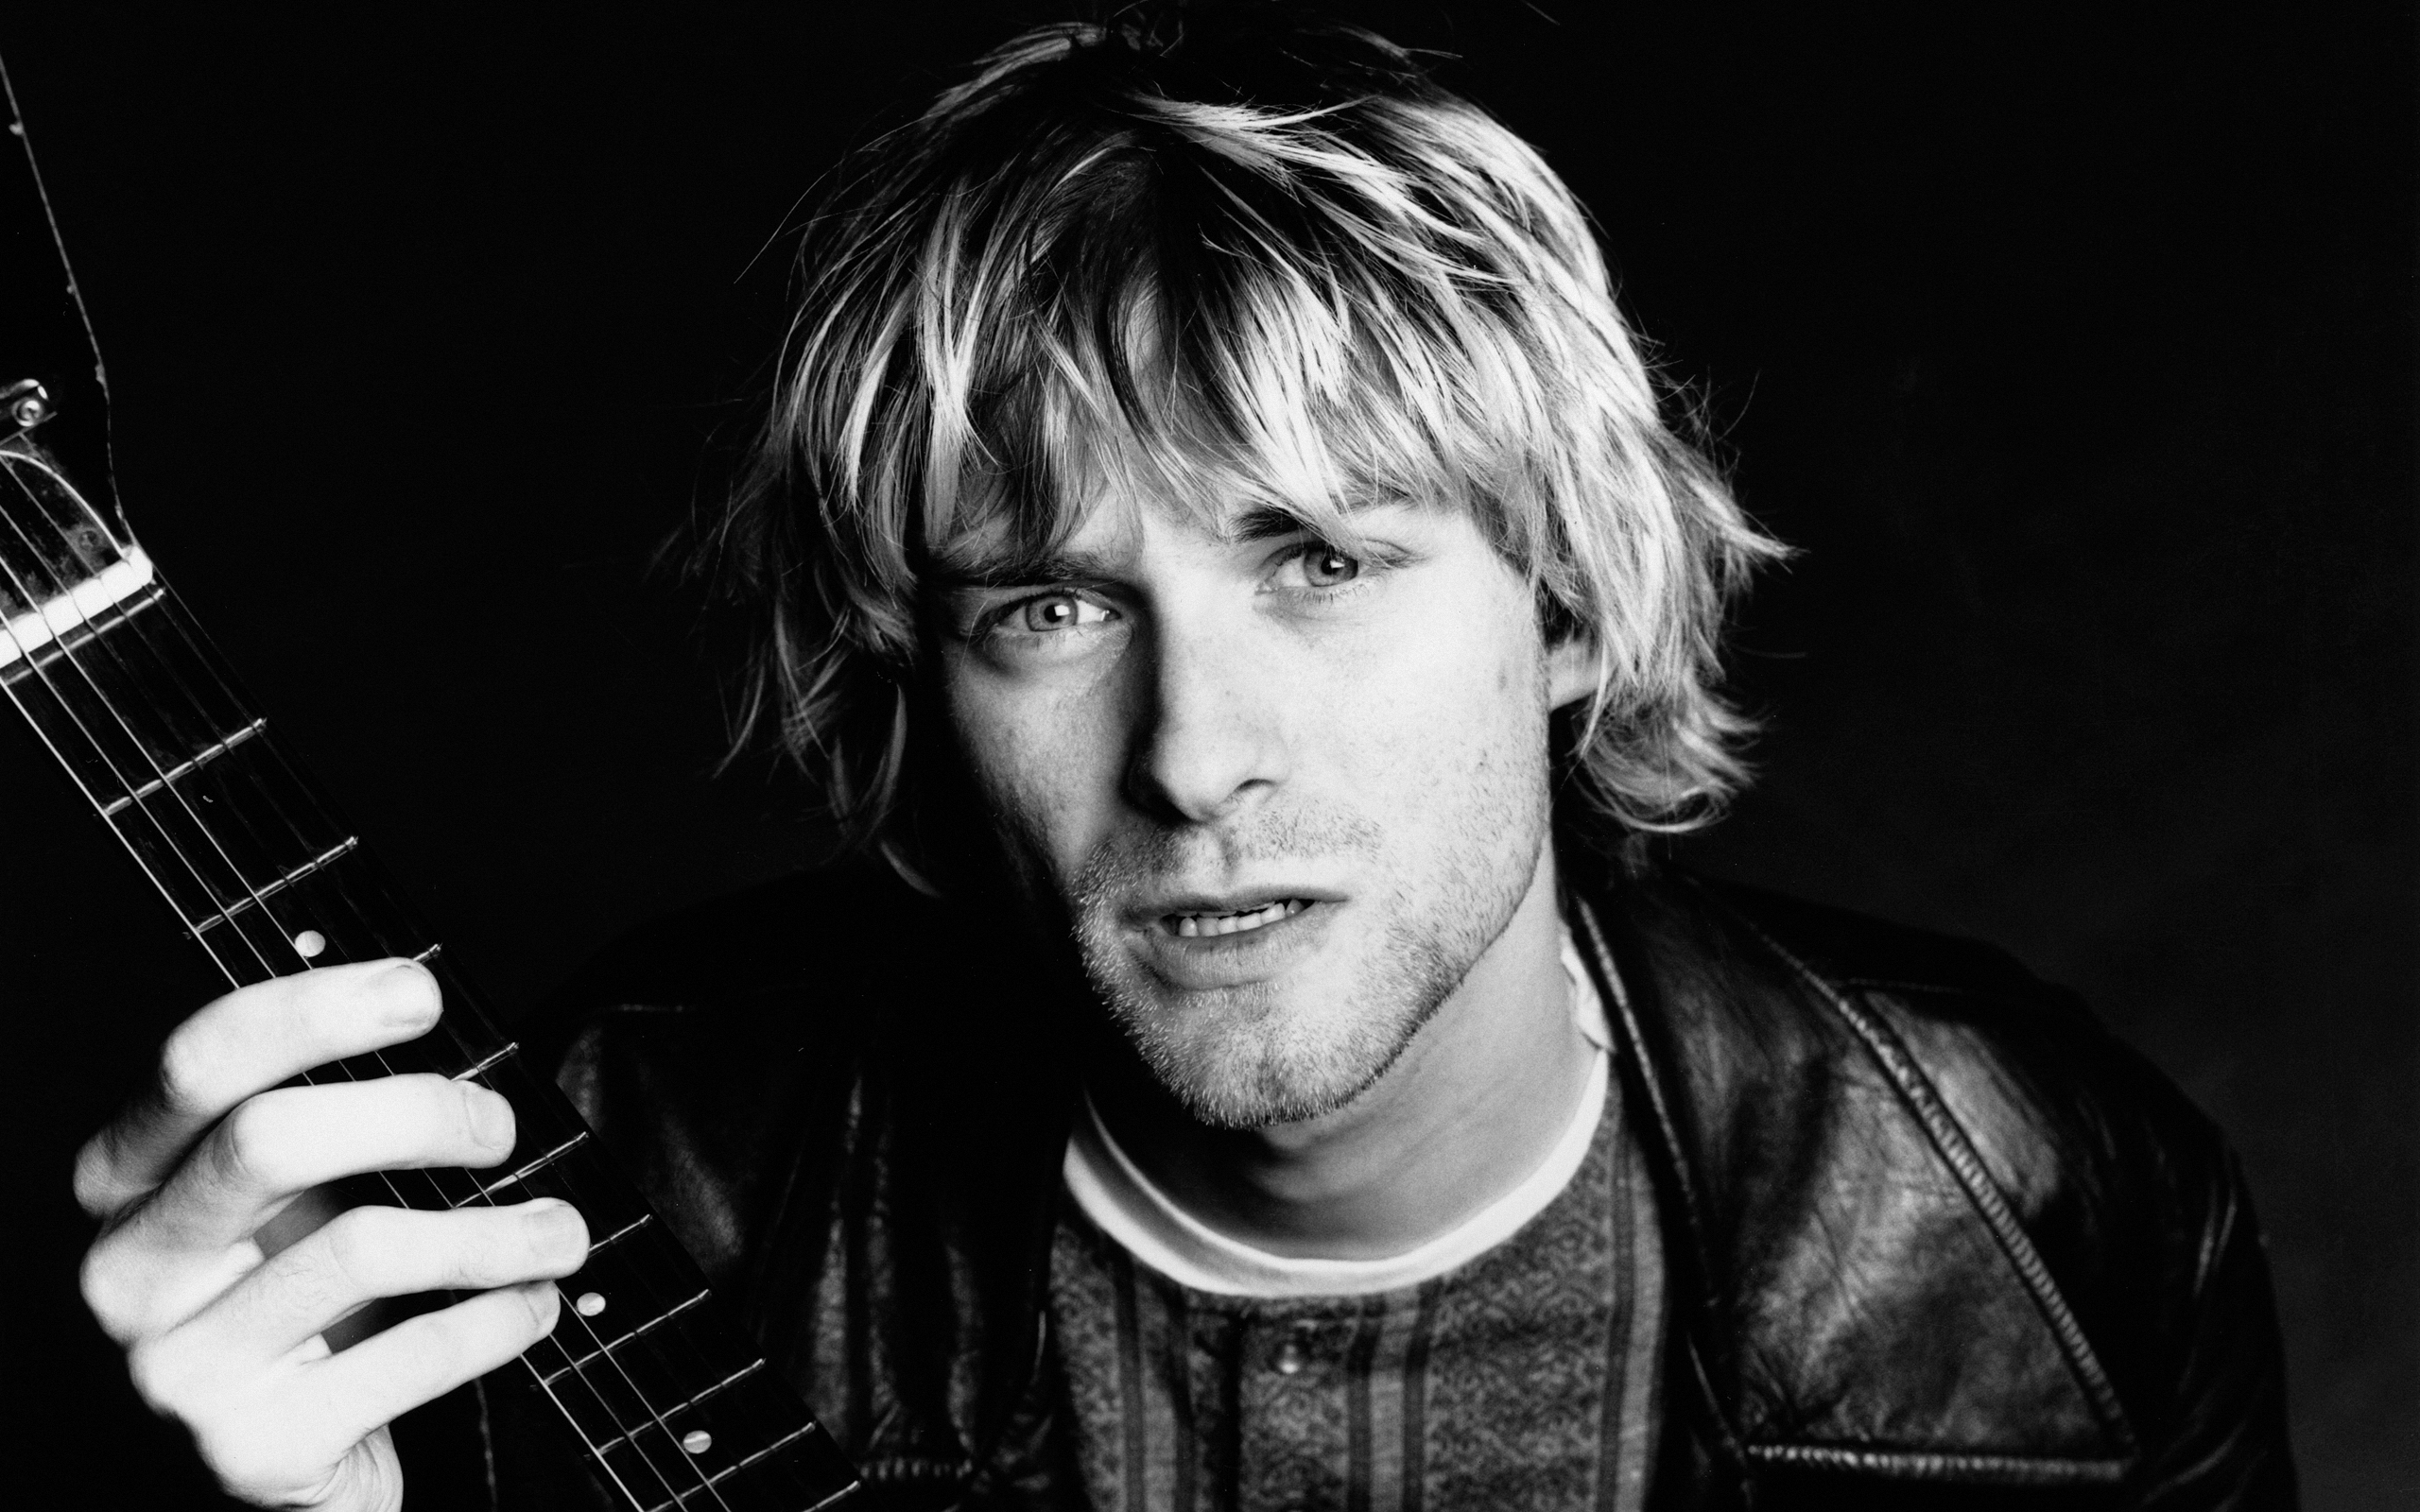 Kurt cobain film to be accompanied by book release skin - Kurt cobain nirvana wallpaper ...